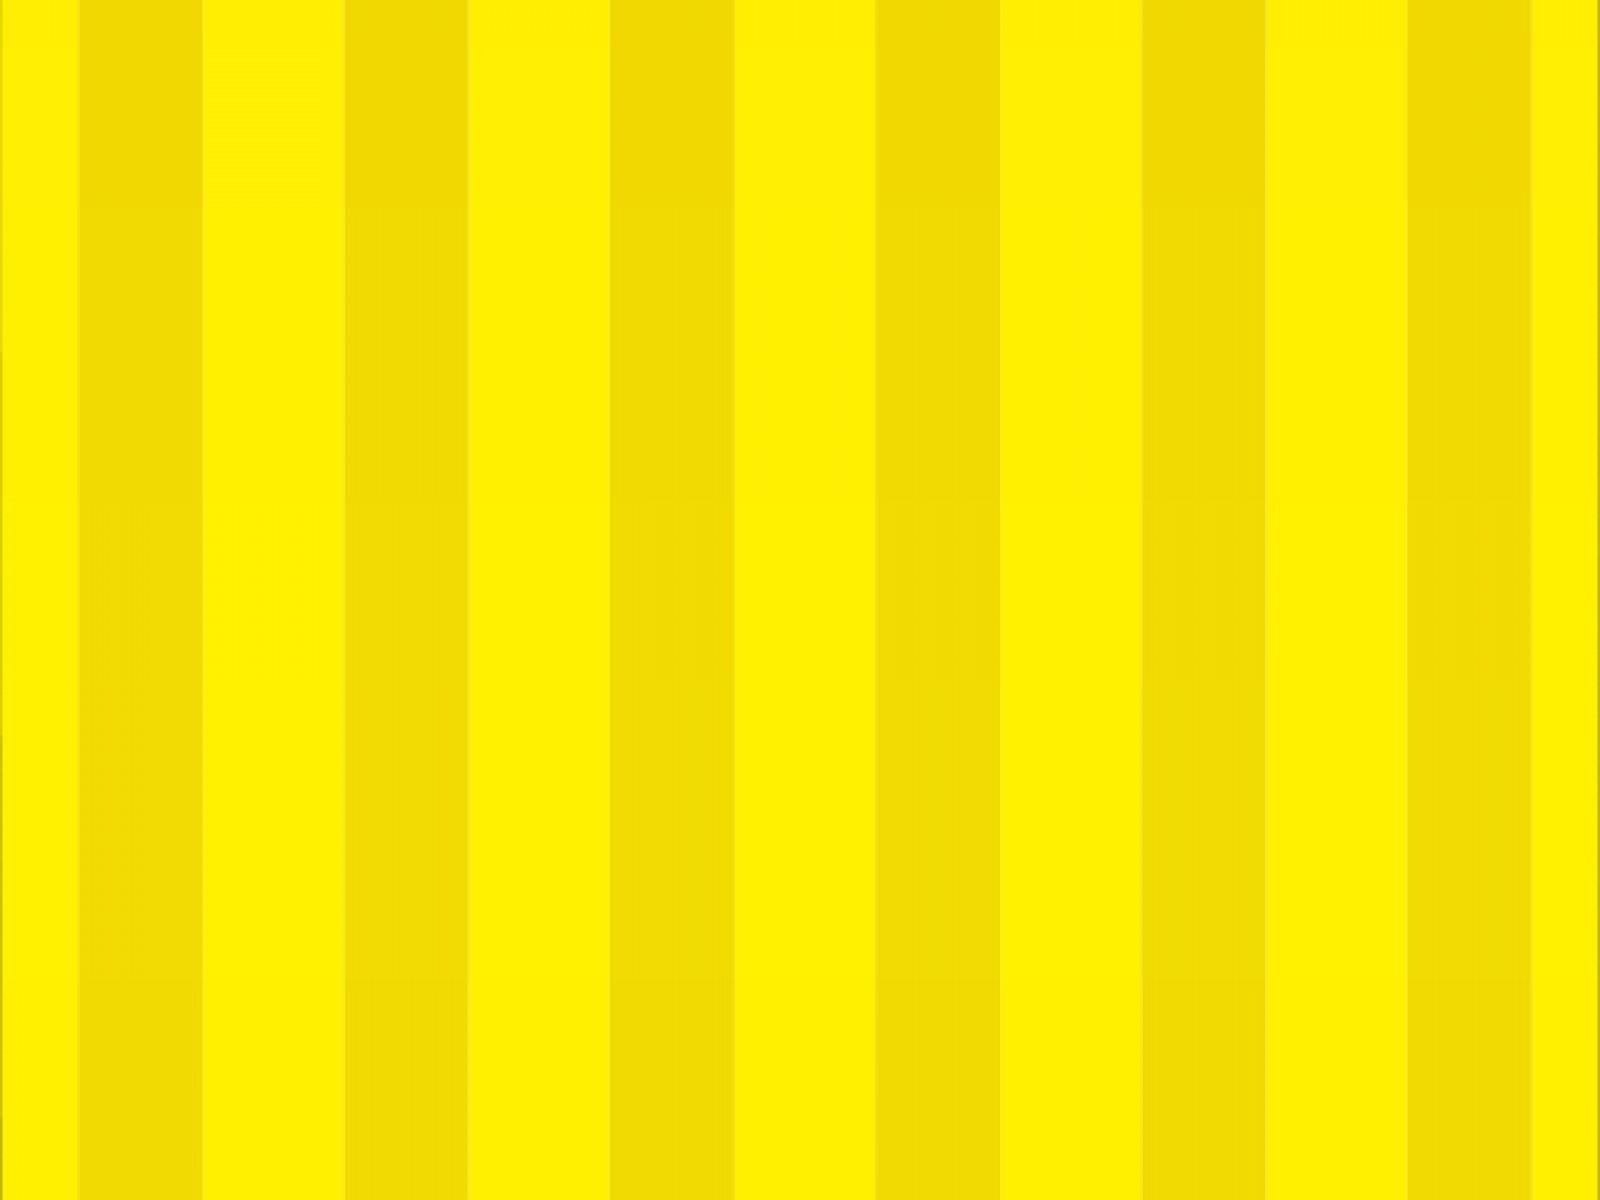 yellow wallpaper 16297